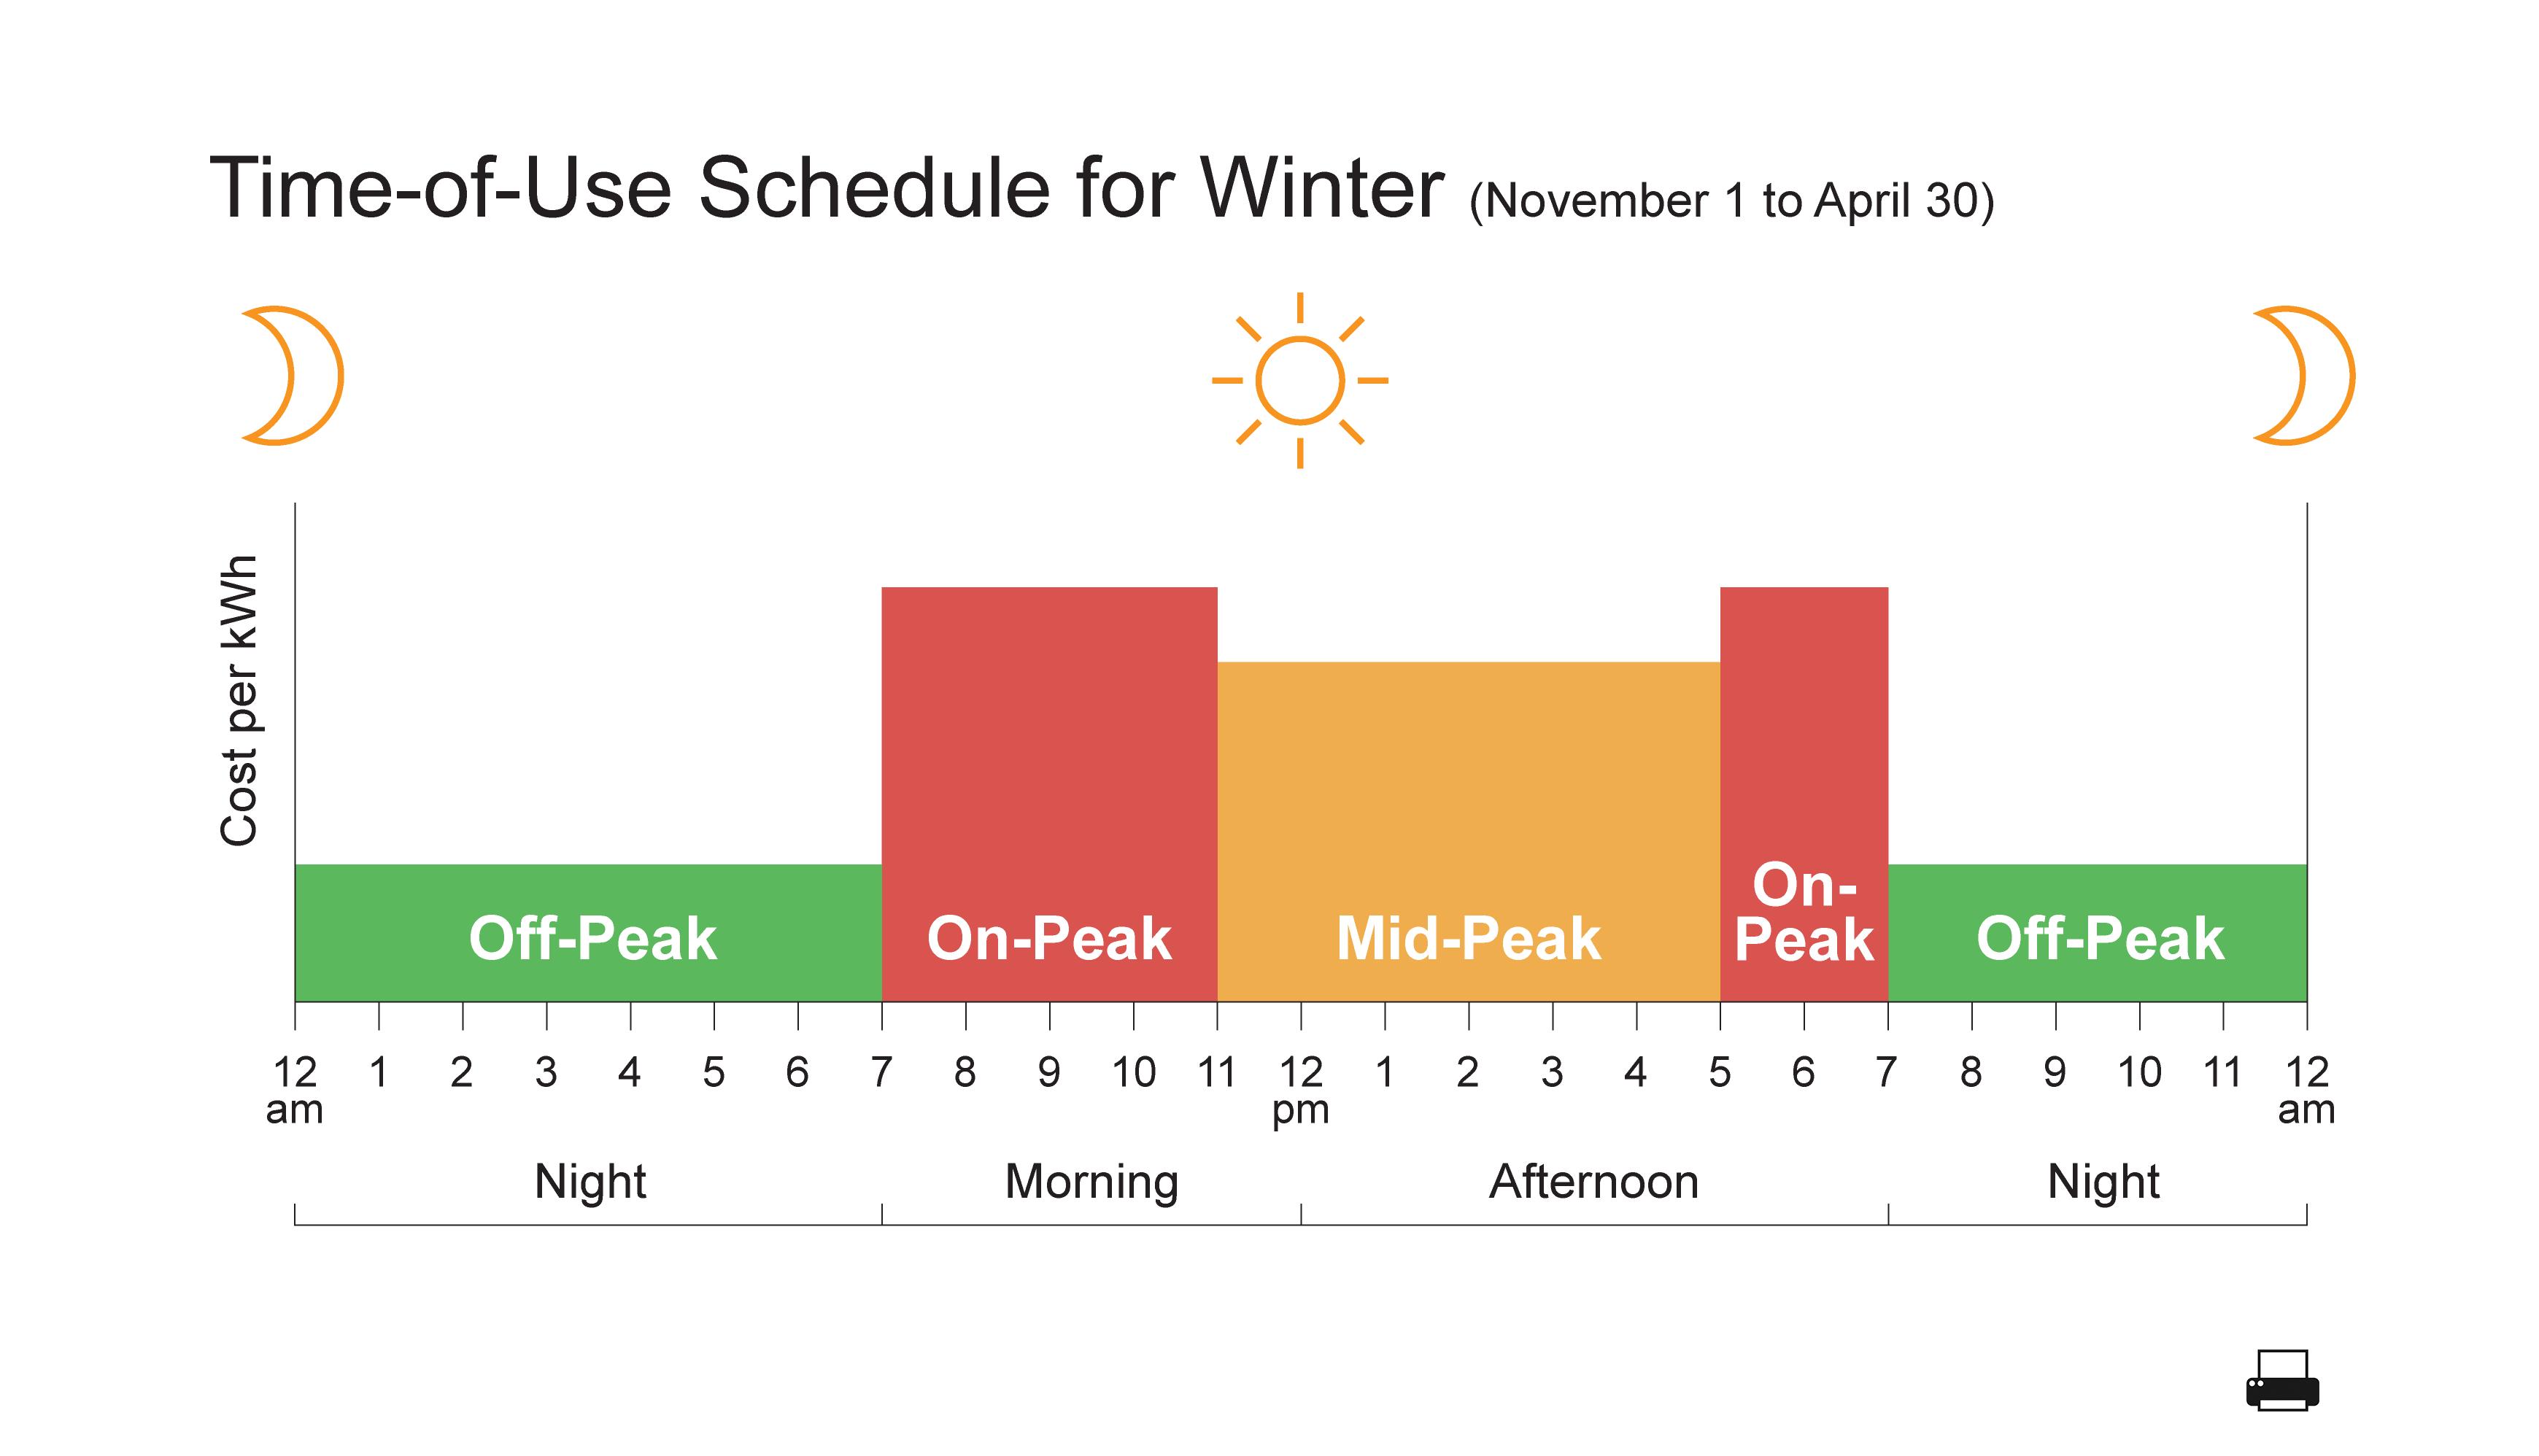 Winter Weekdays (November 1 to April 30)